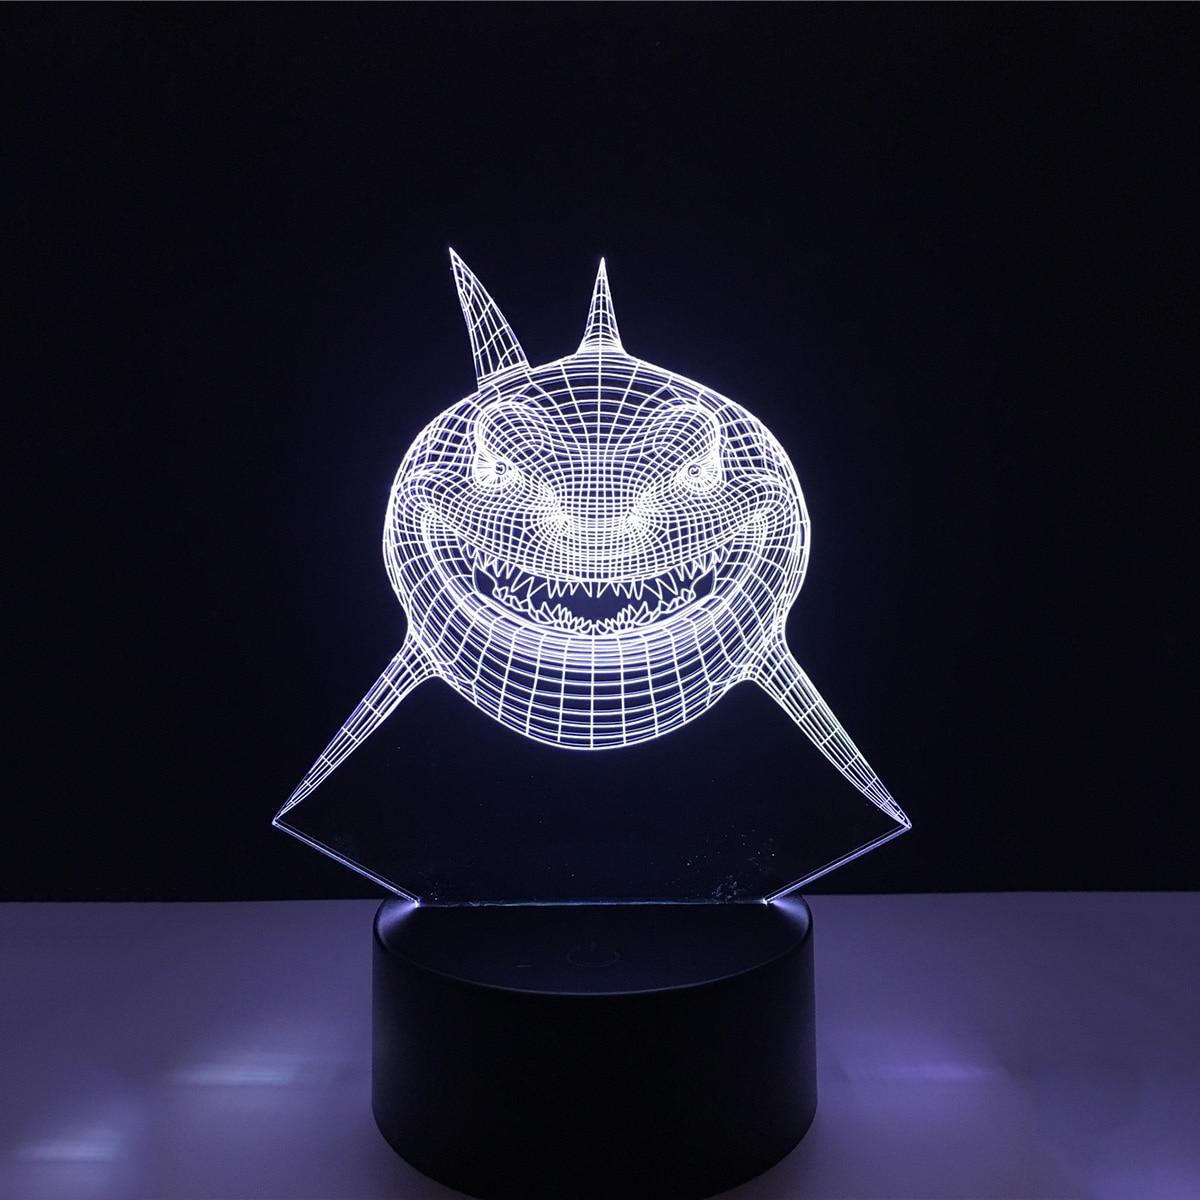 3D Shark Acrylic LED Lamp 3D Baby Night Light Sleeping Lighting For Children Night Light Xmas New Years DIY Light P25